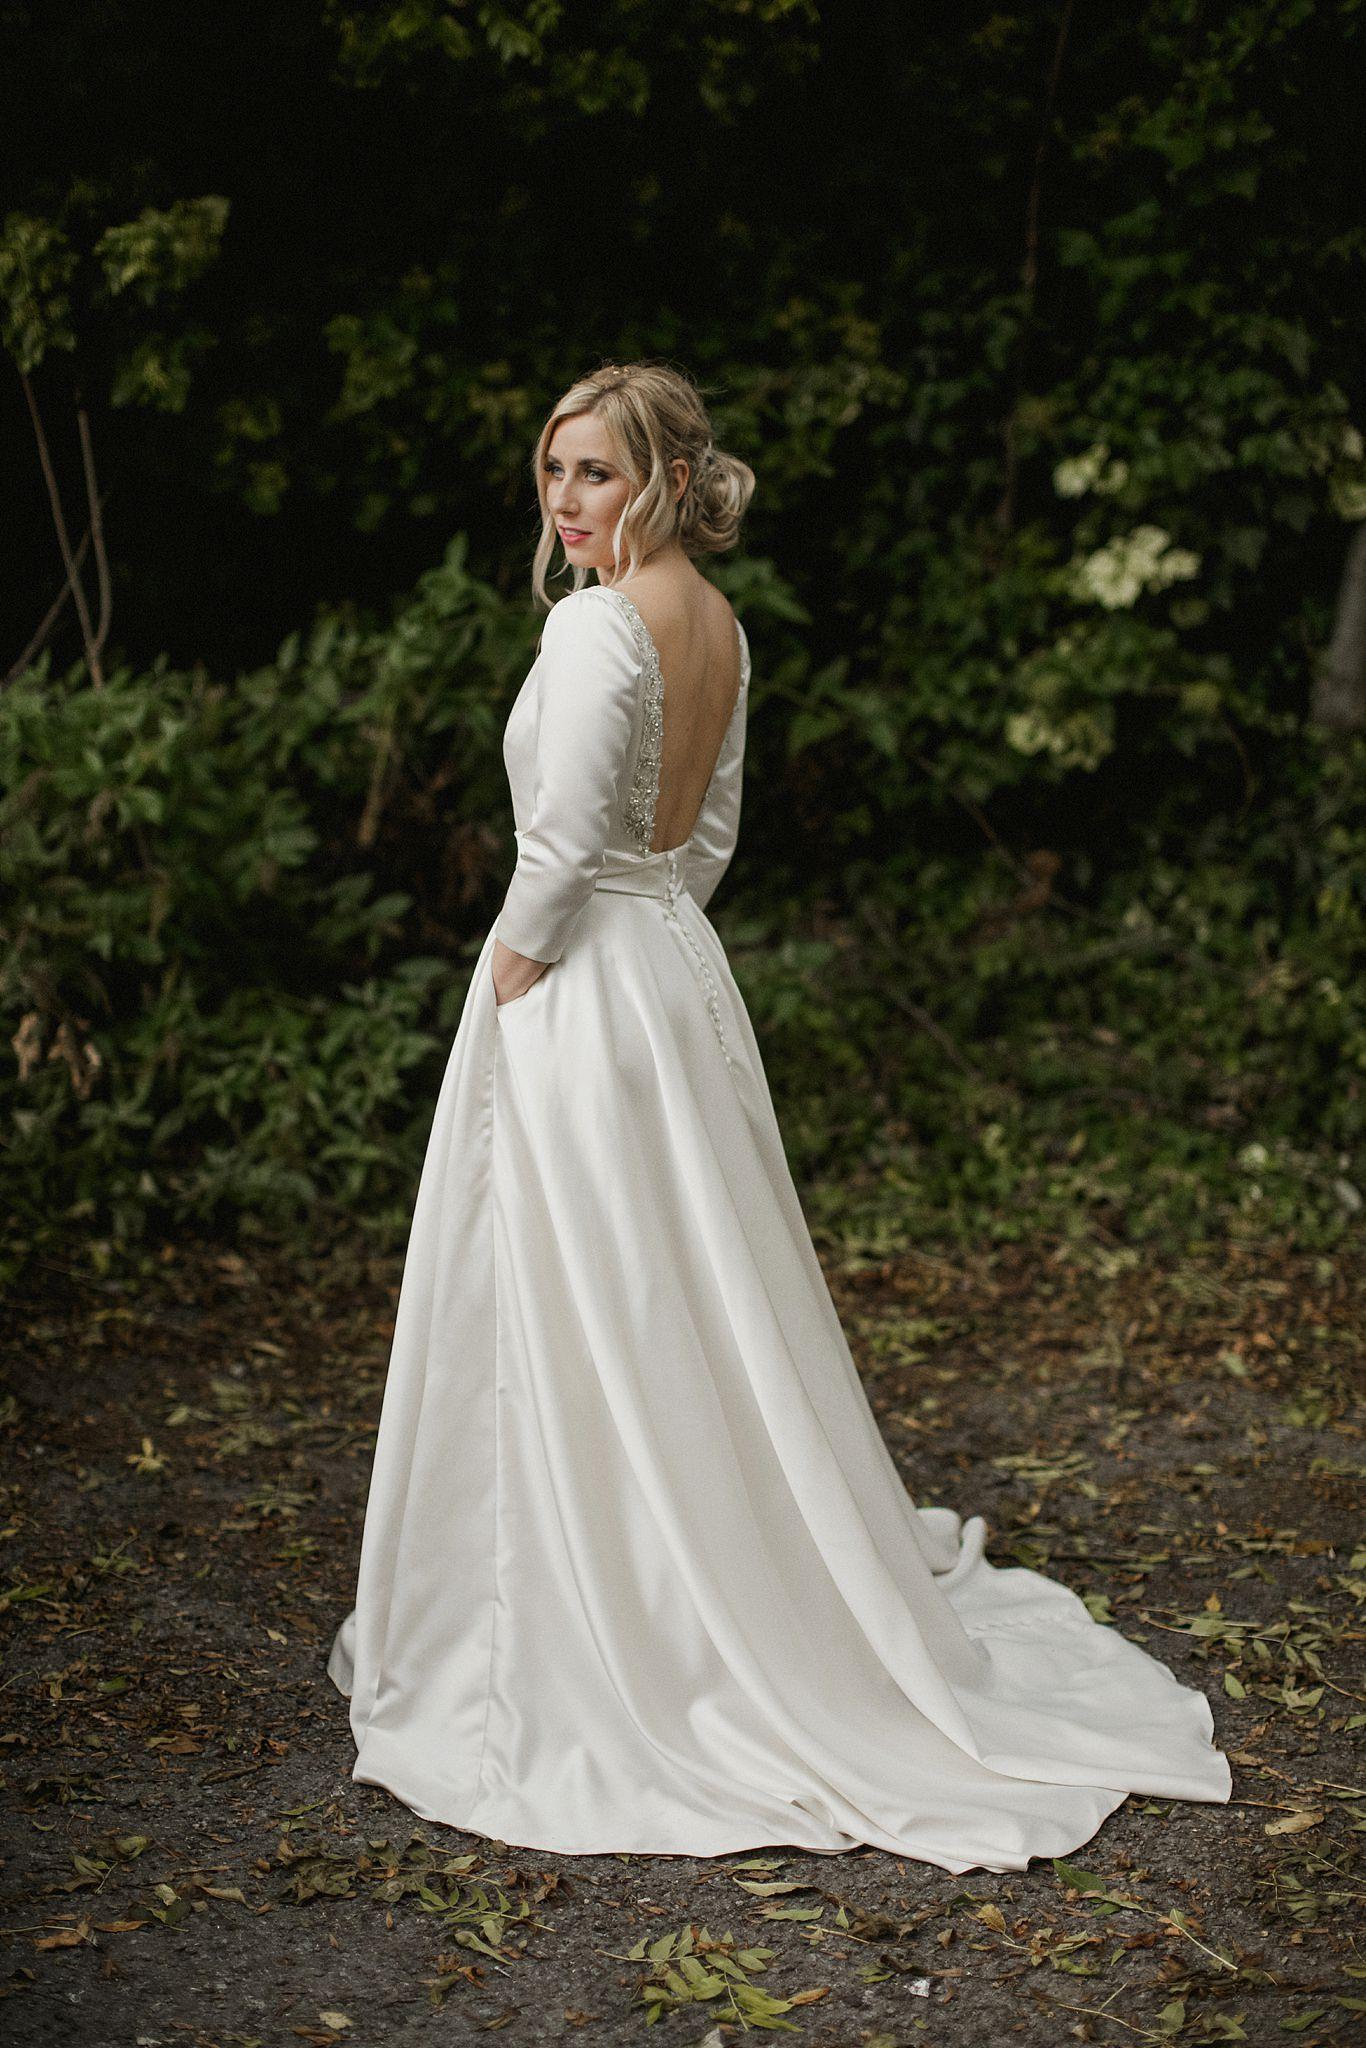 Sheffield_Wedding_Photography_0036.jpg